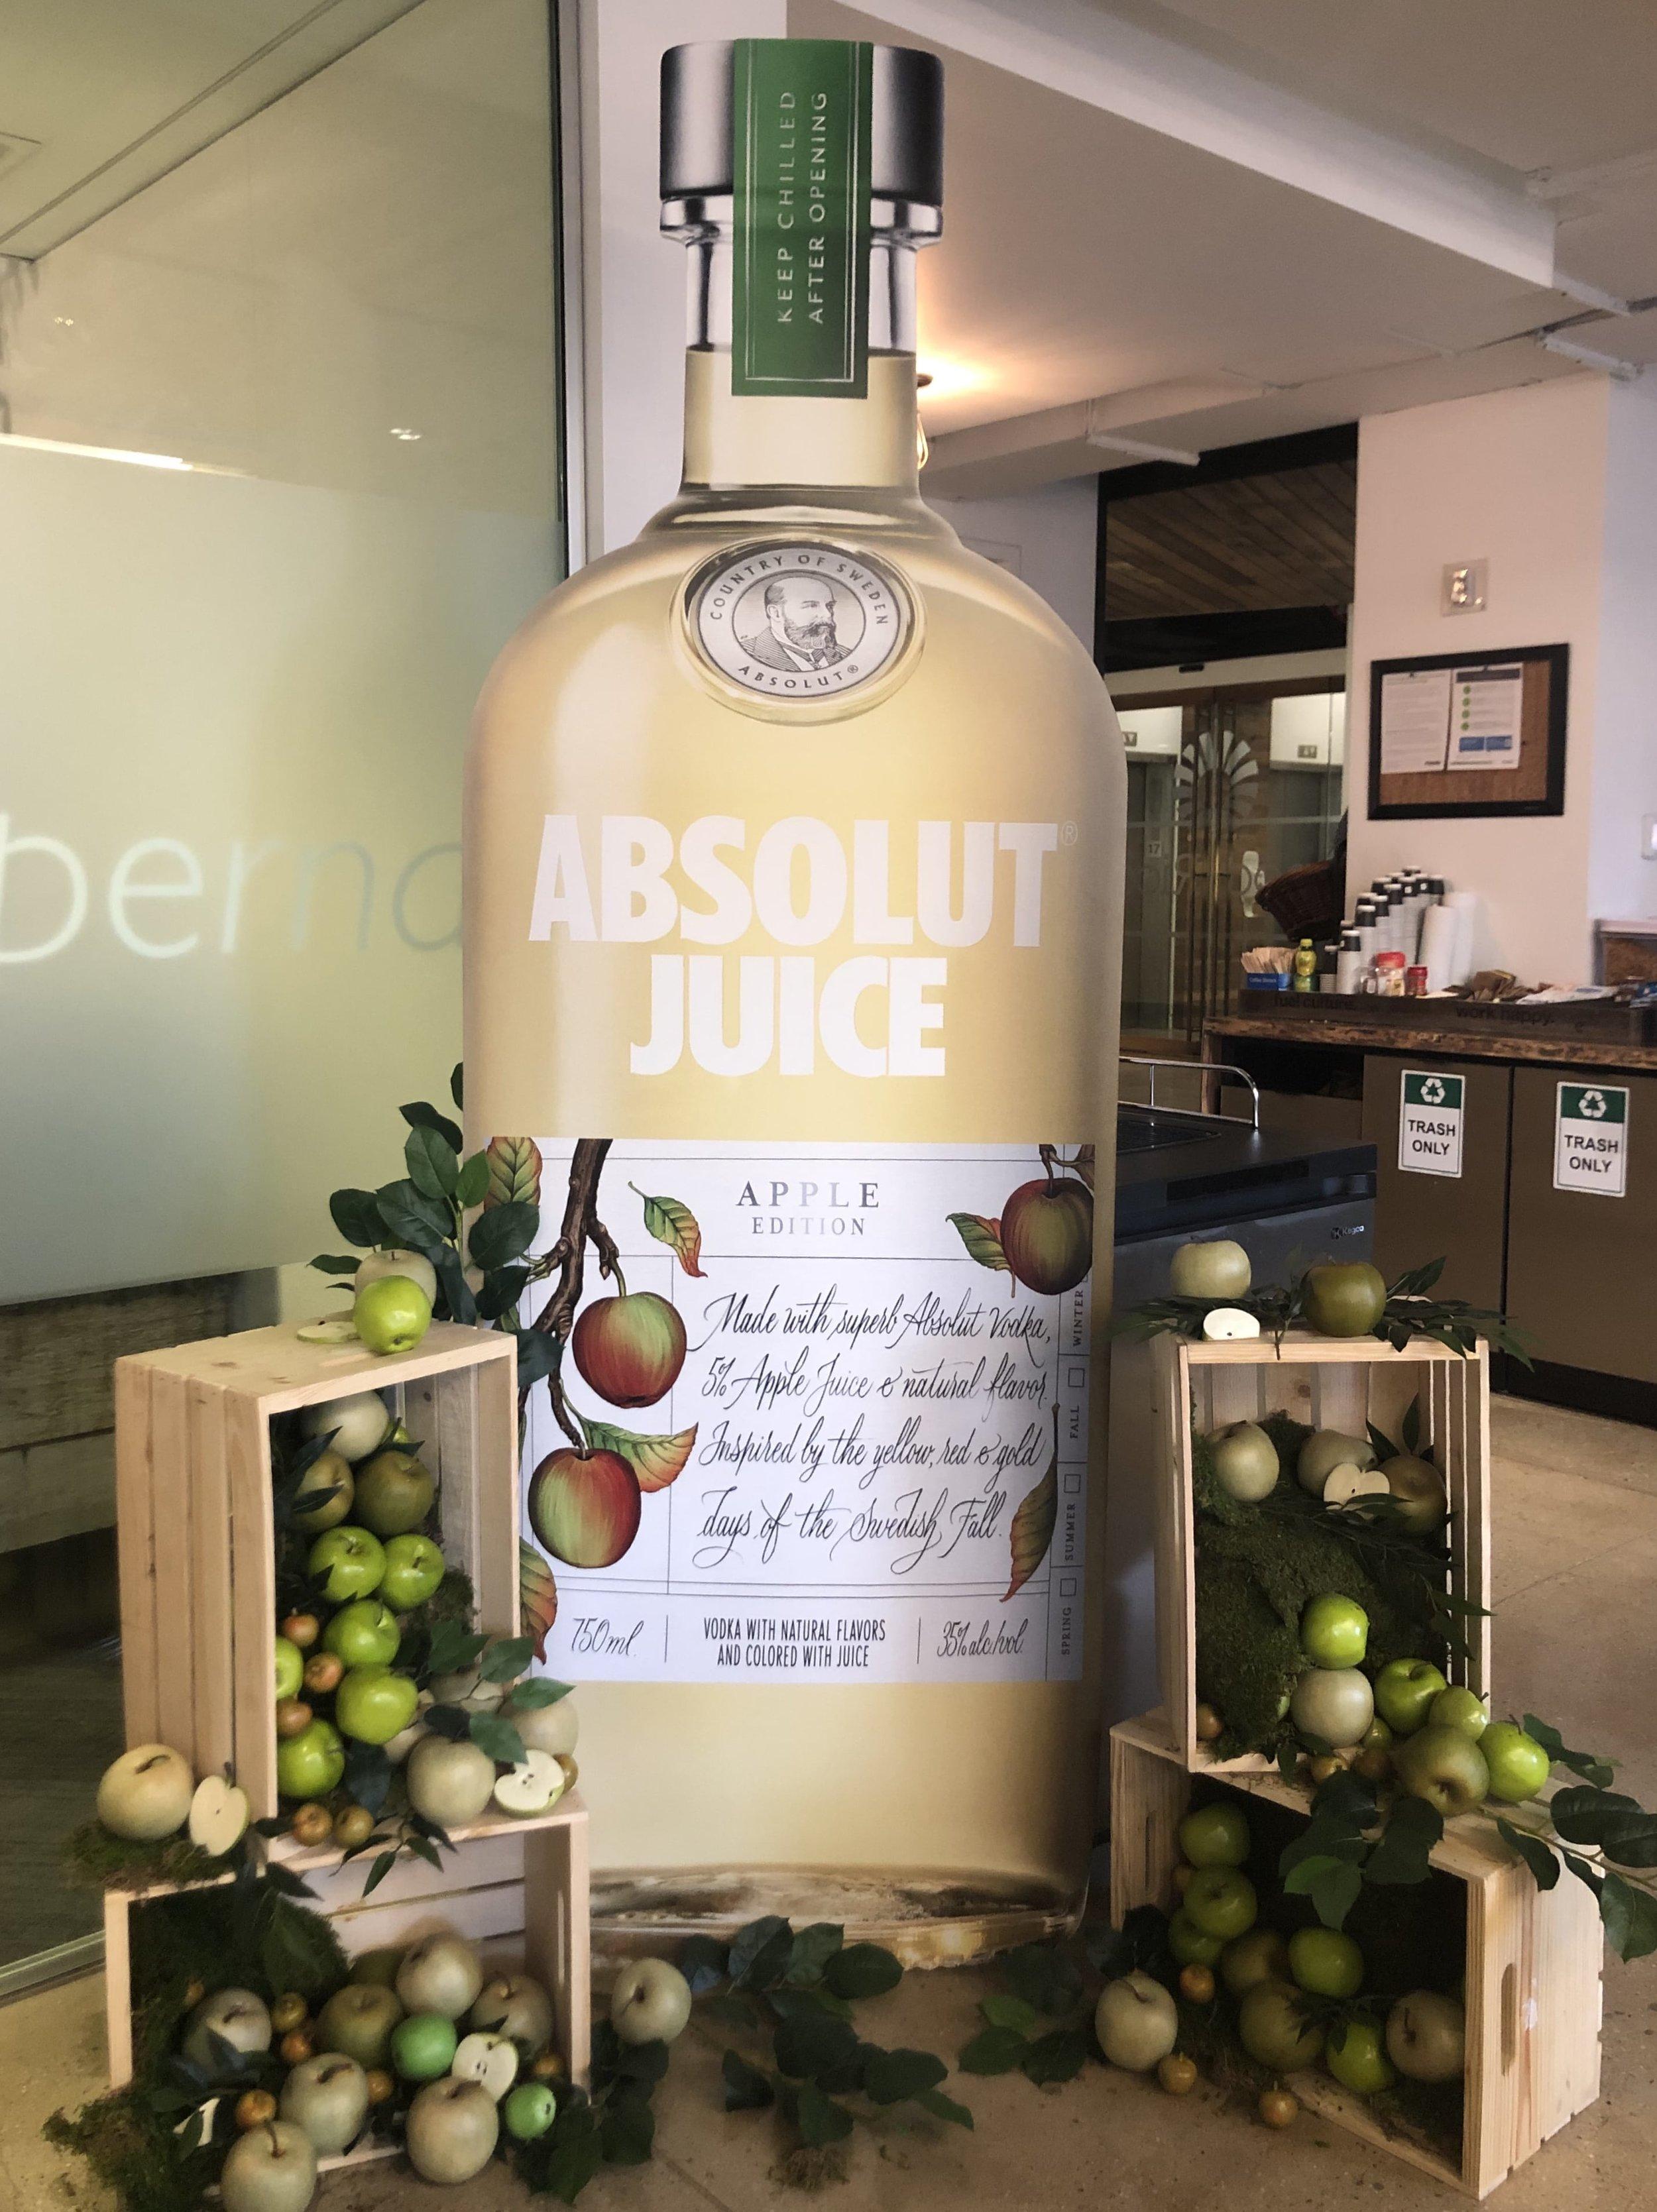 Absoult Juice Installation- B Floral